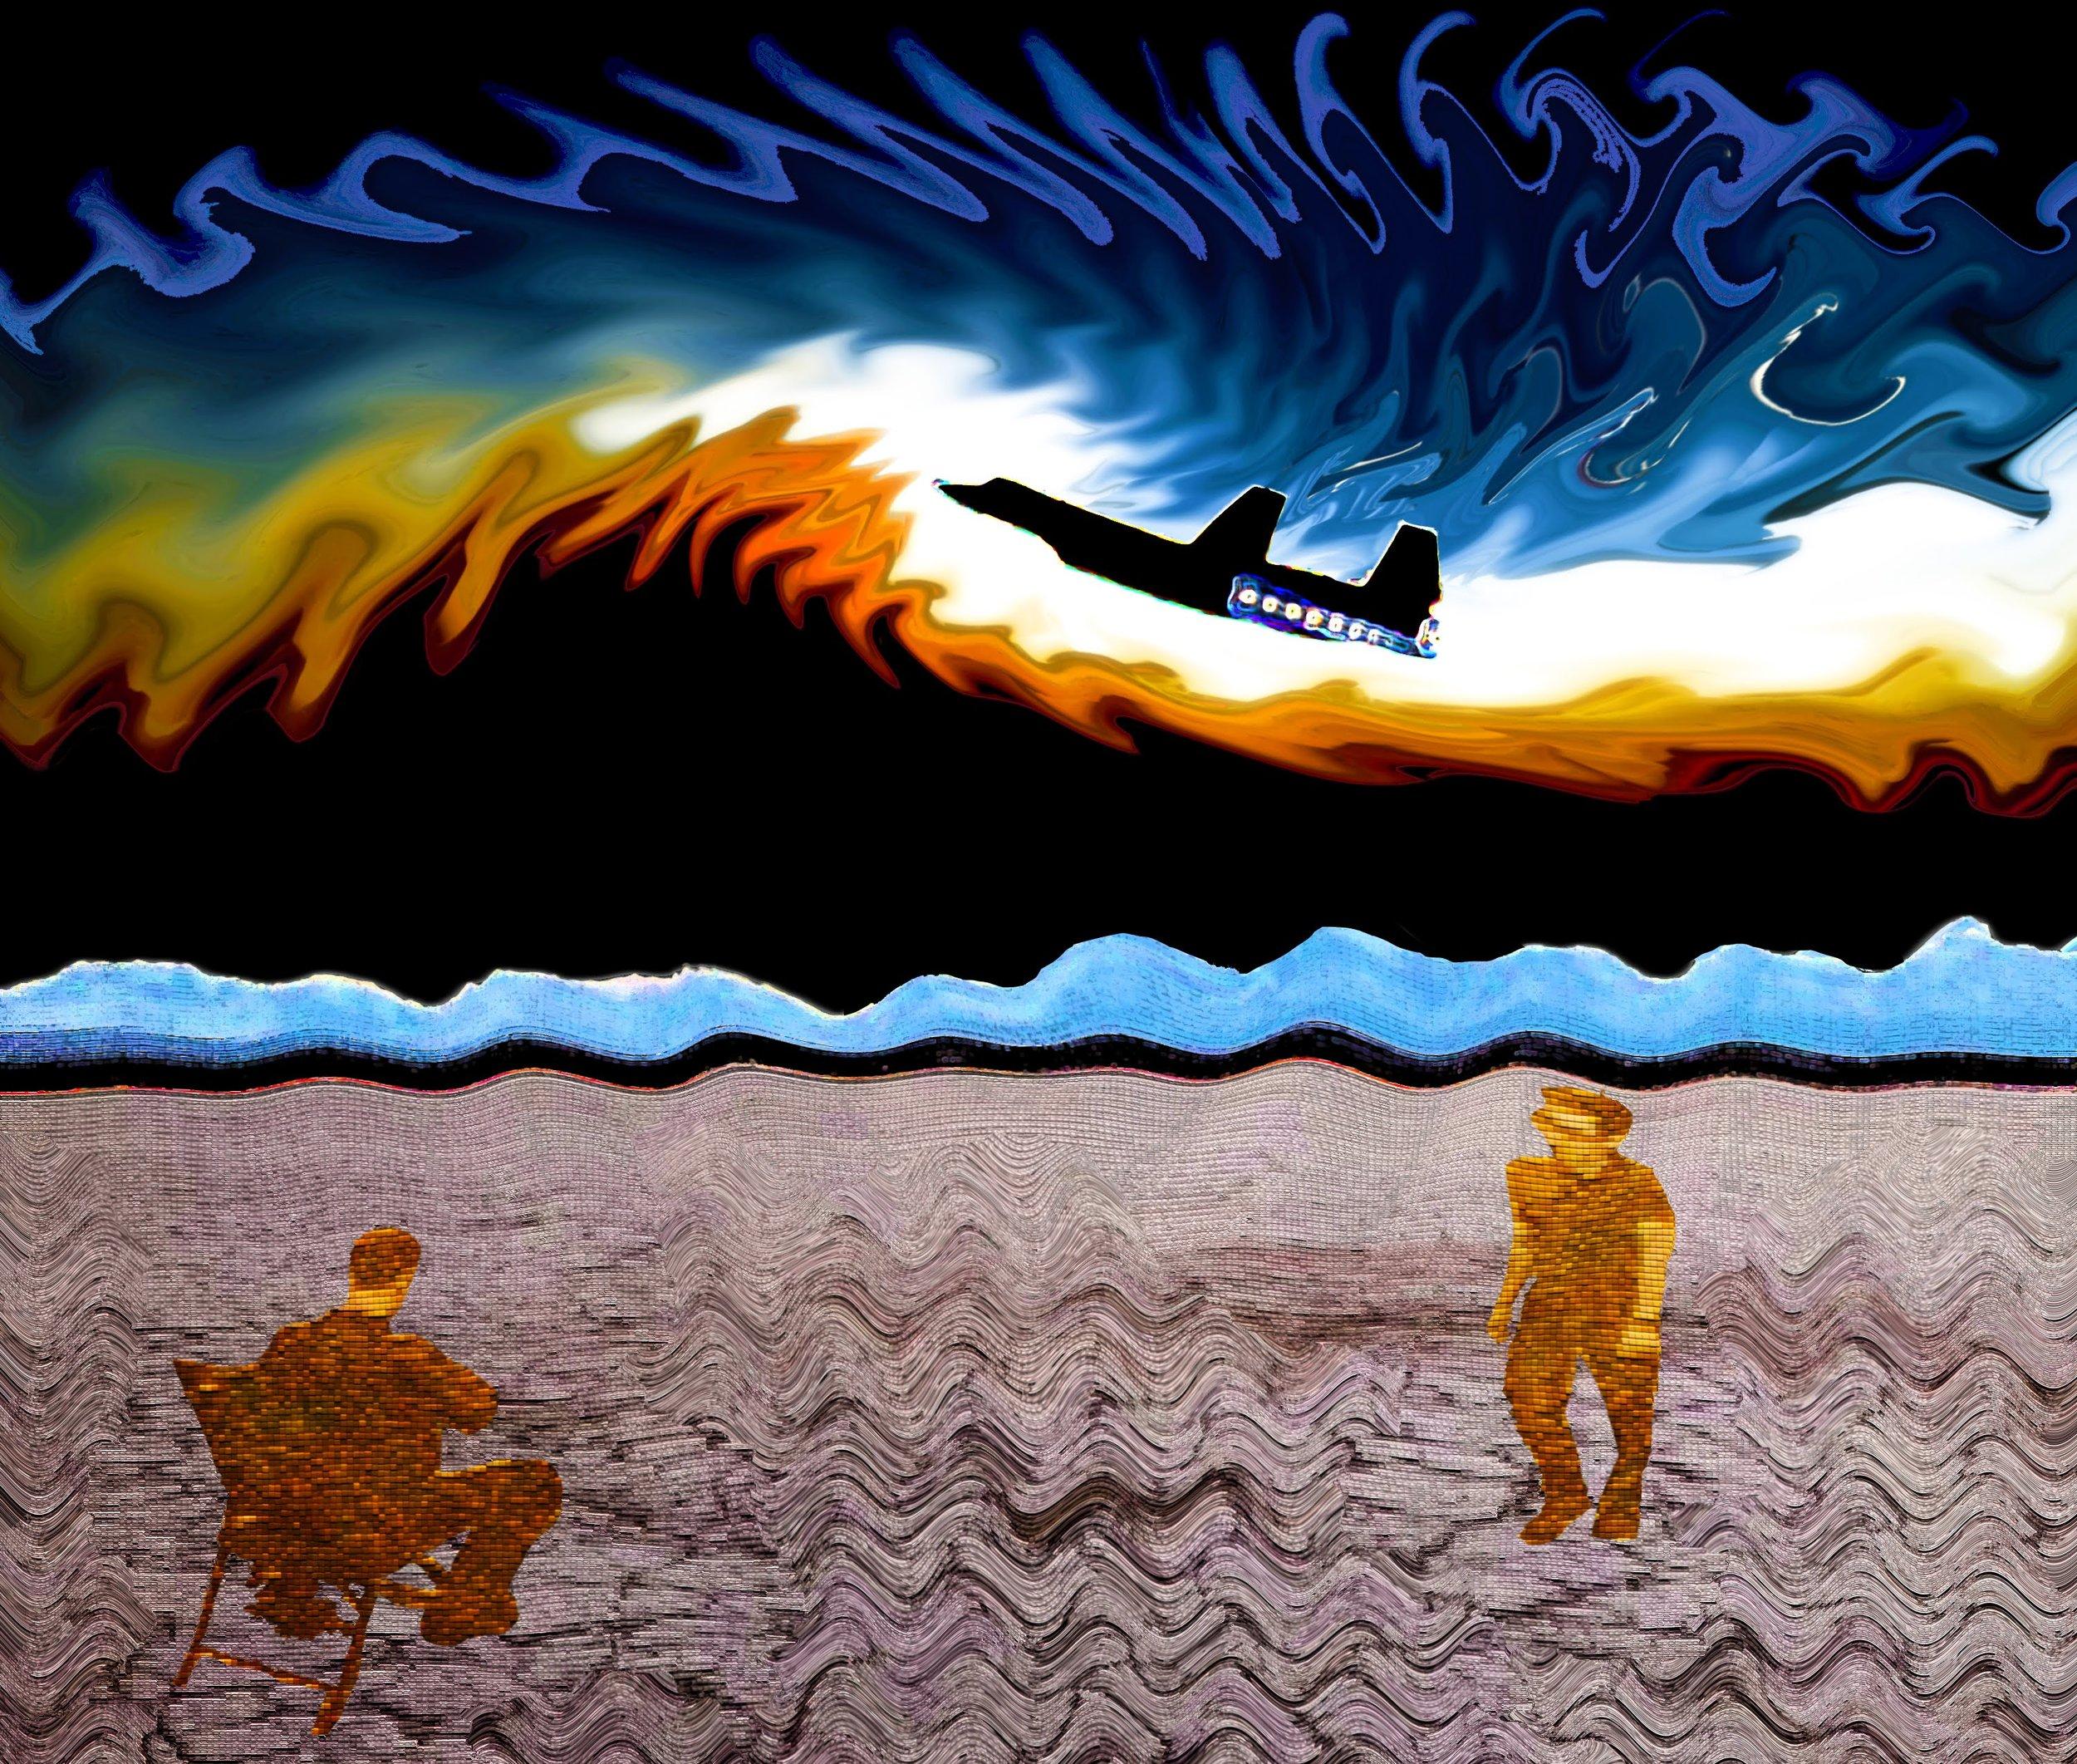 desert scenario (blackbird ii).jpg